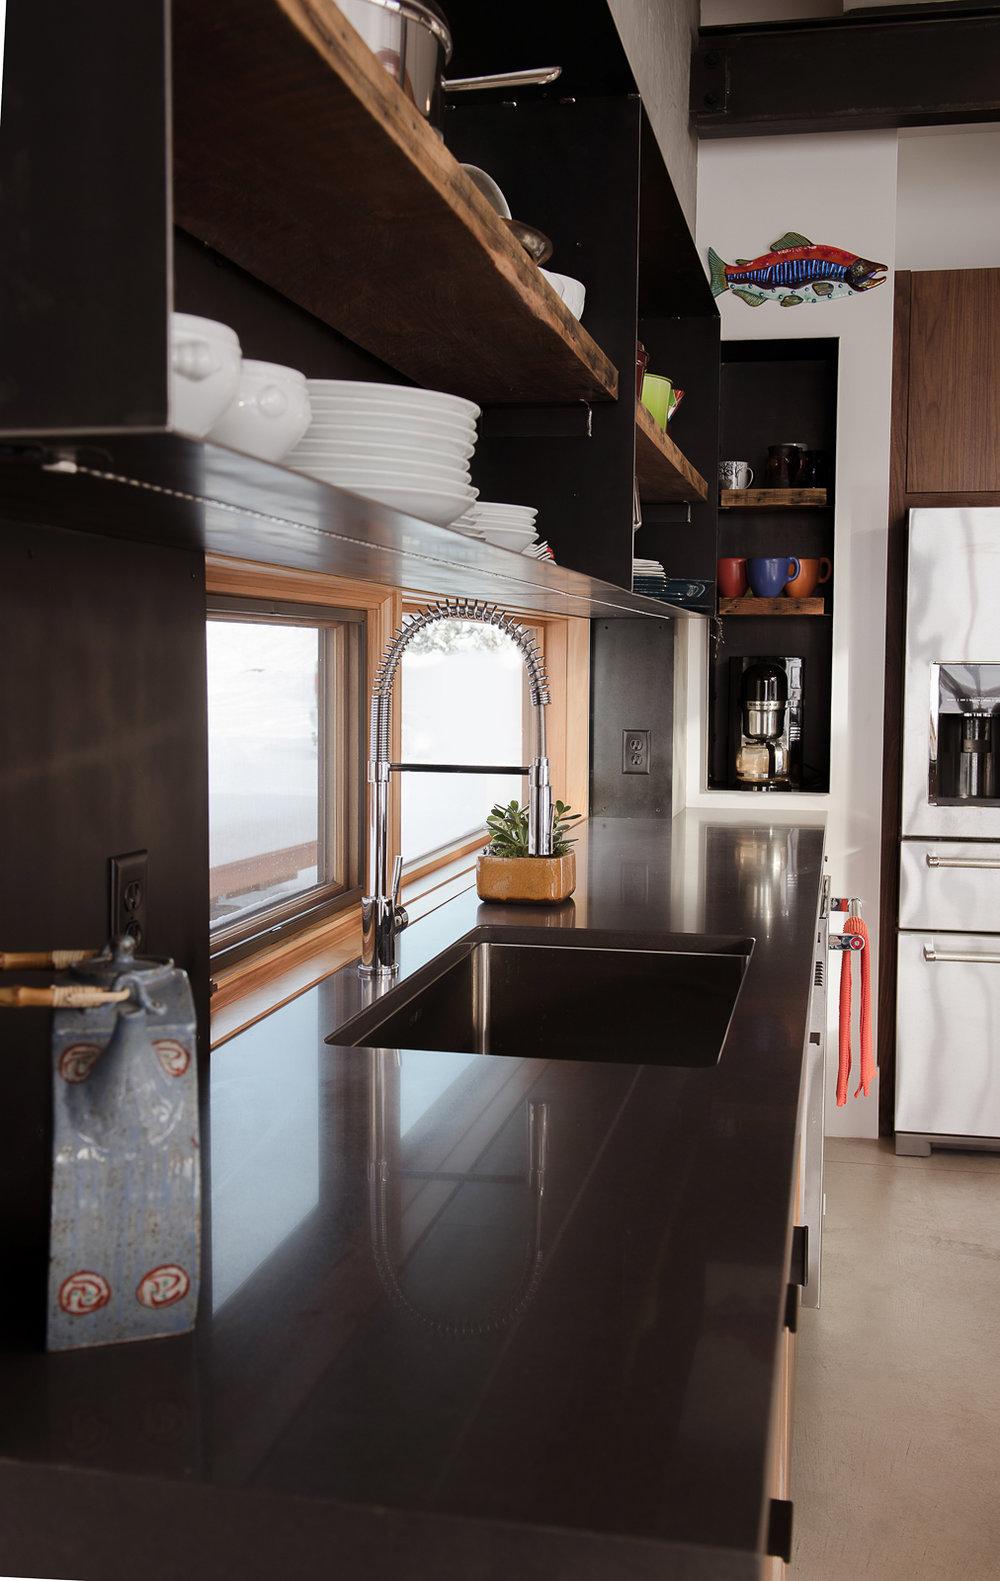 Woodworks-West-Bozeman-Montana-Builder-Cabinetry-Remodel-New-Construction-4426.jpg